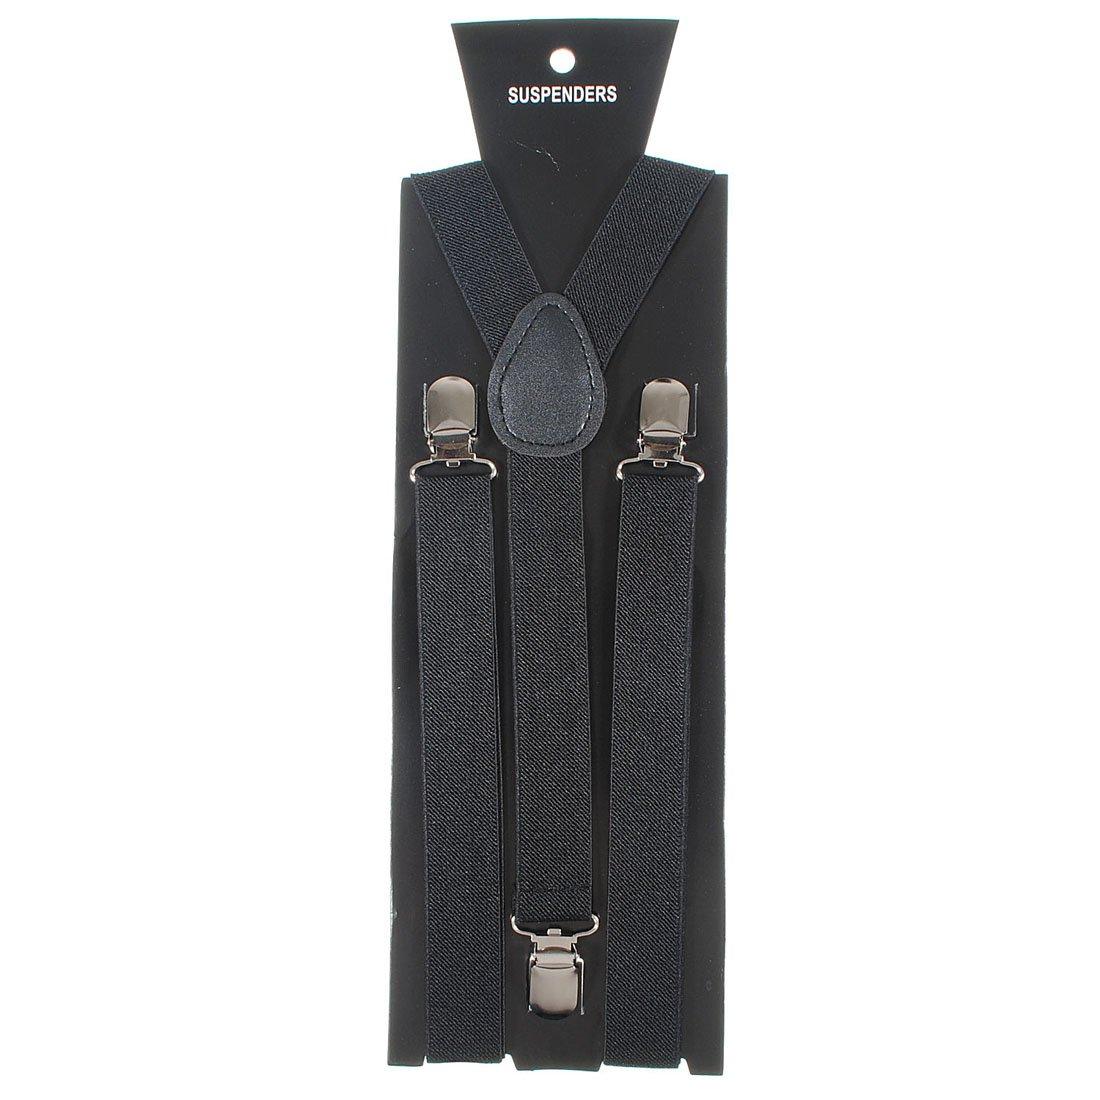 Adjustable Unisex Adult Child Elastic Clip-on Brace Suspender Y back Neon Belt,Black homeking Co. LTD